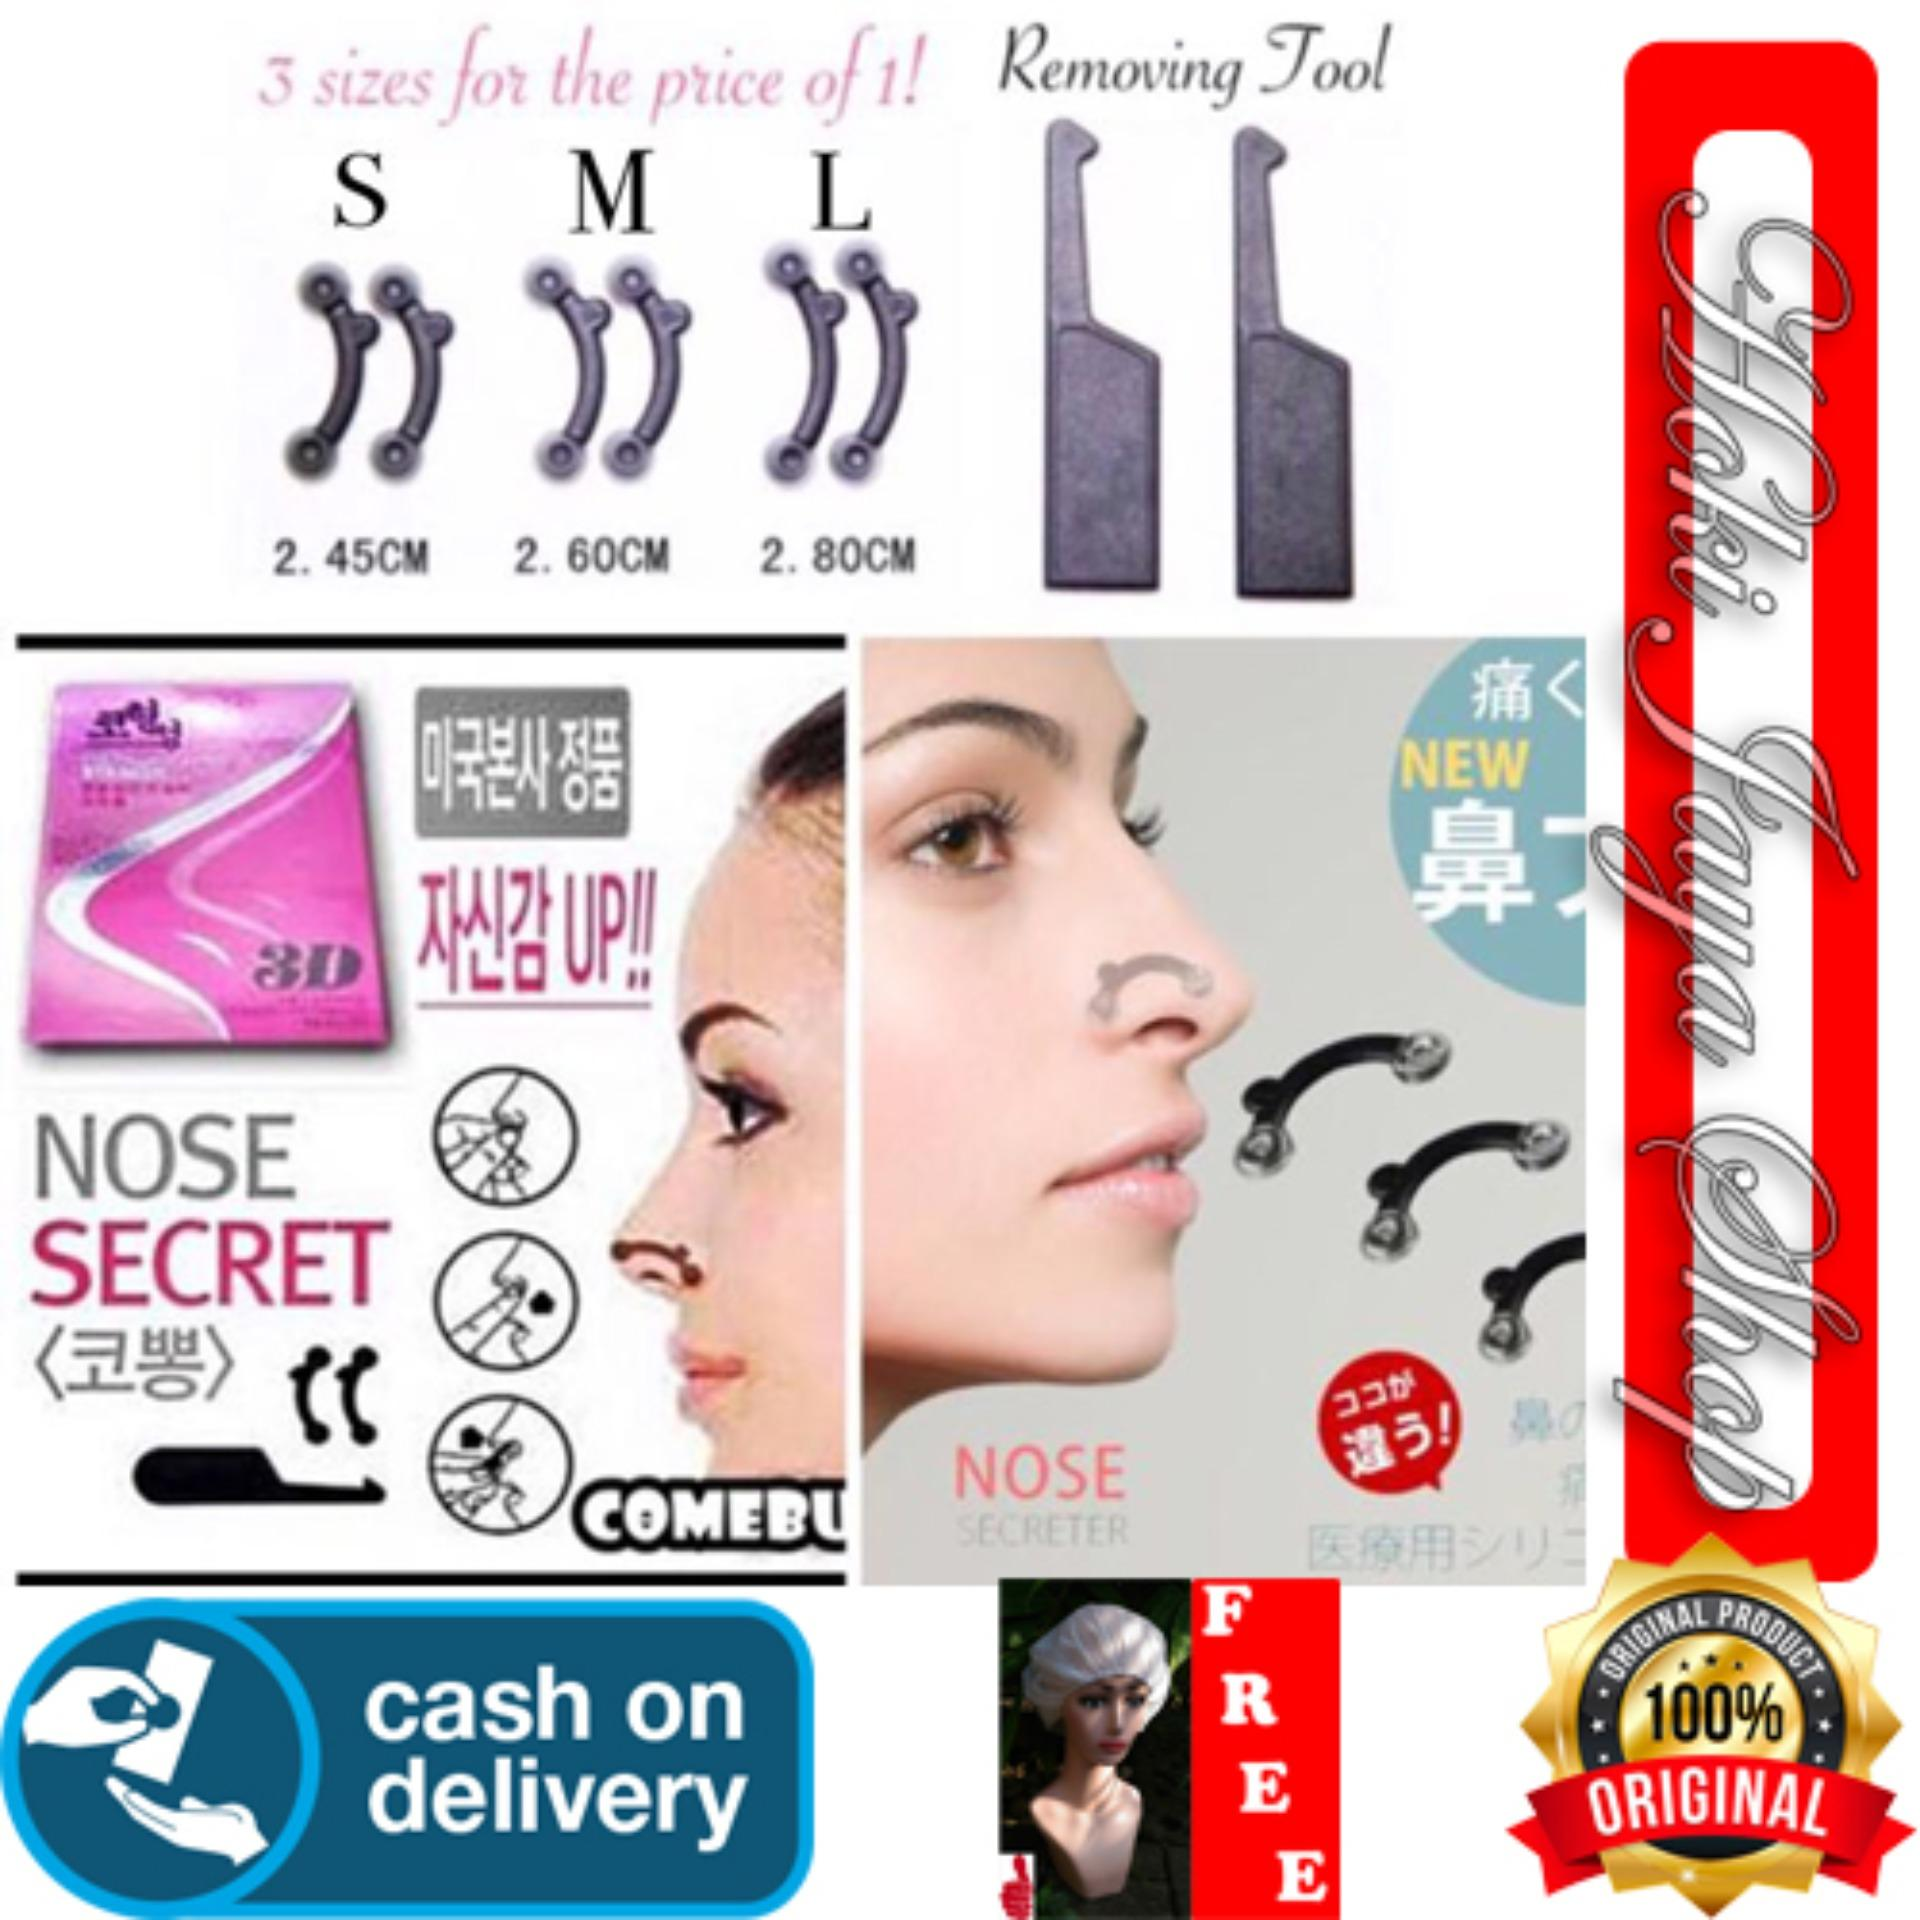 HOKI COD - SECRET NOSE 3D Alat Pemancung Hidung instant 3D/Nose Scret Korea/